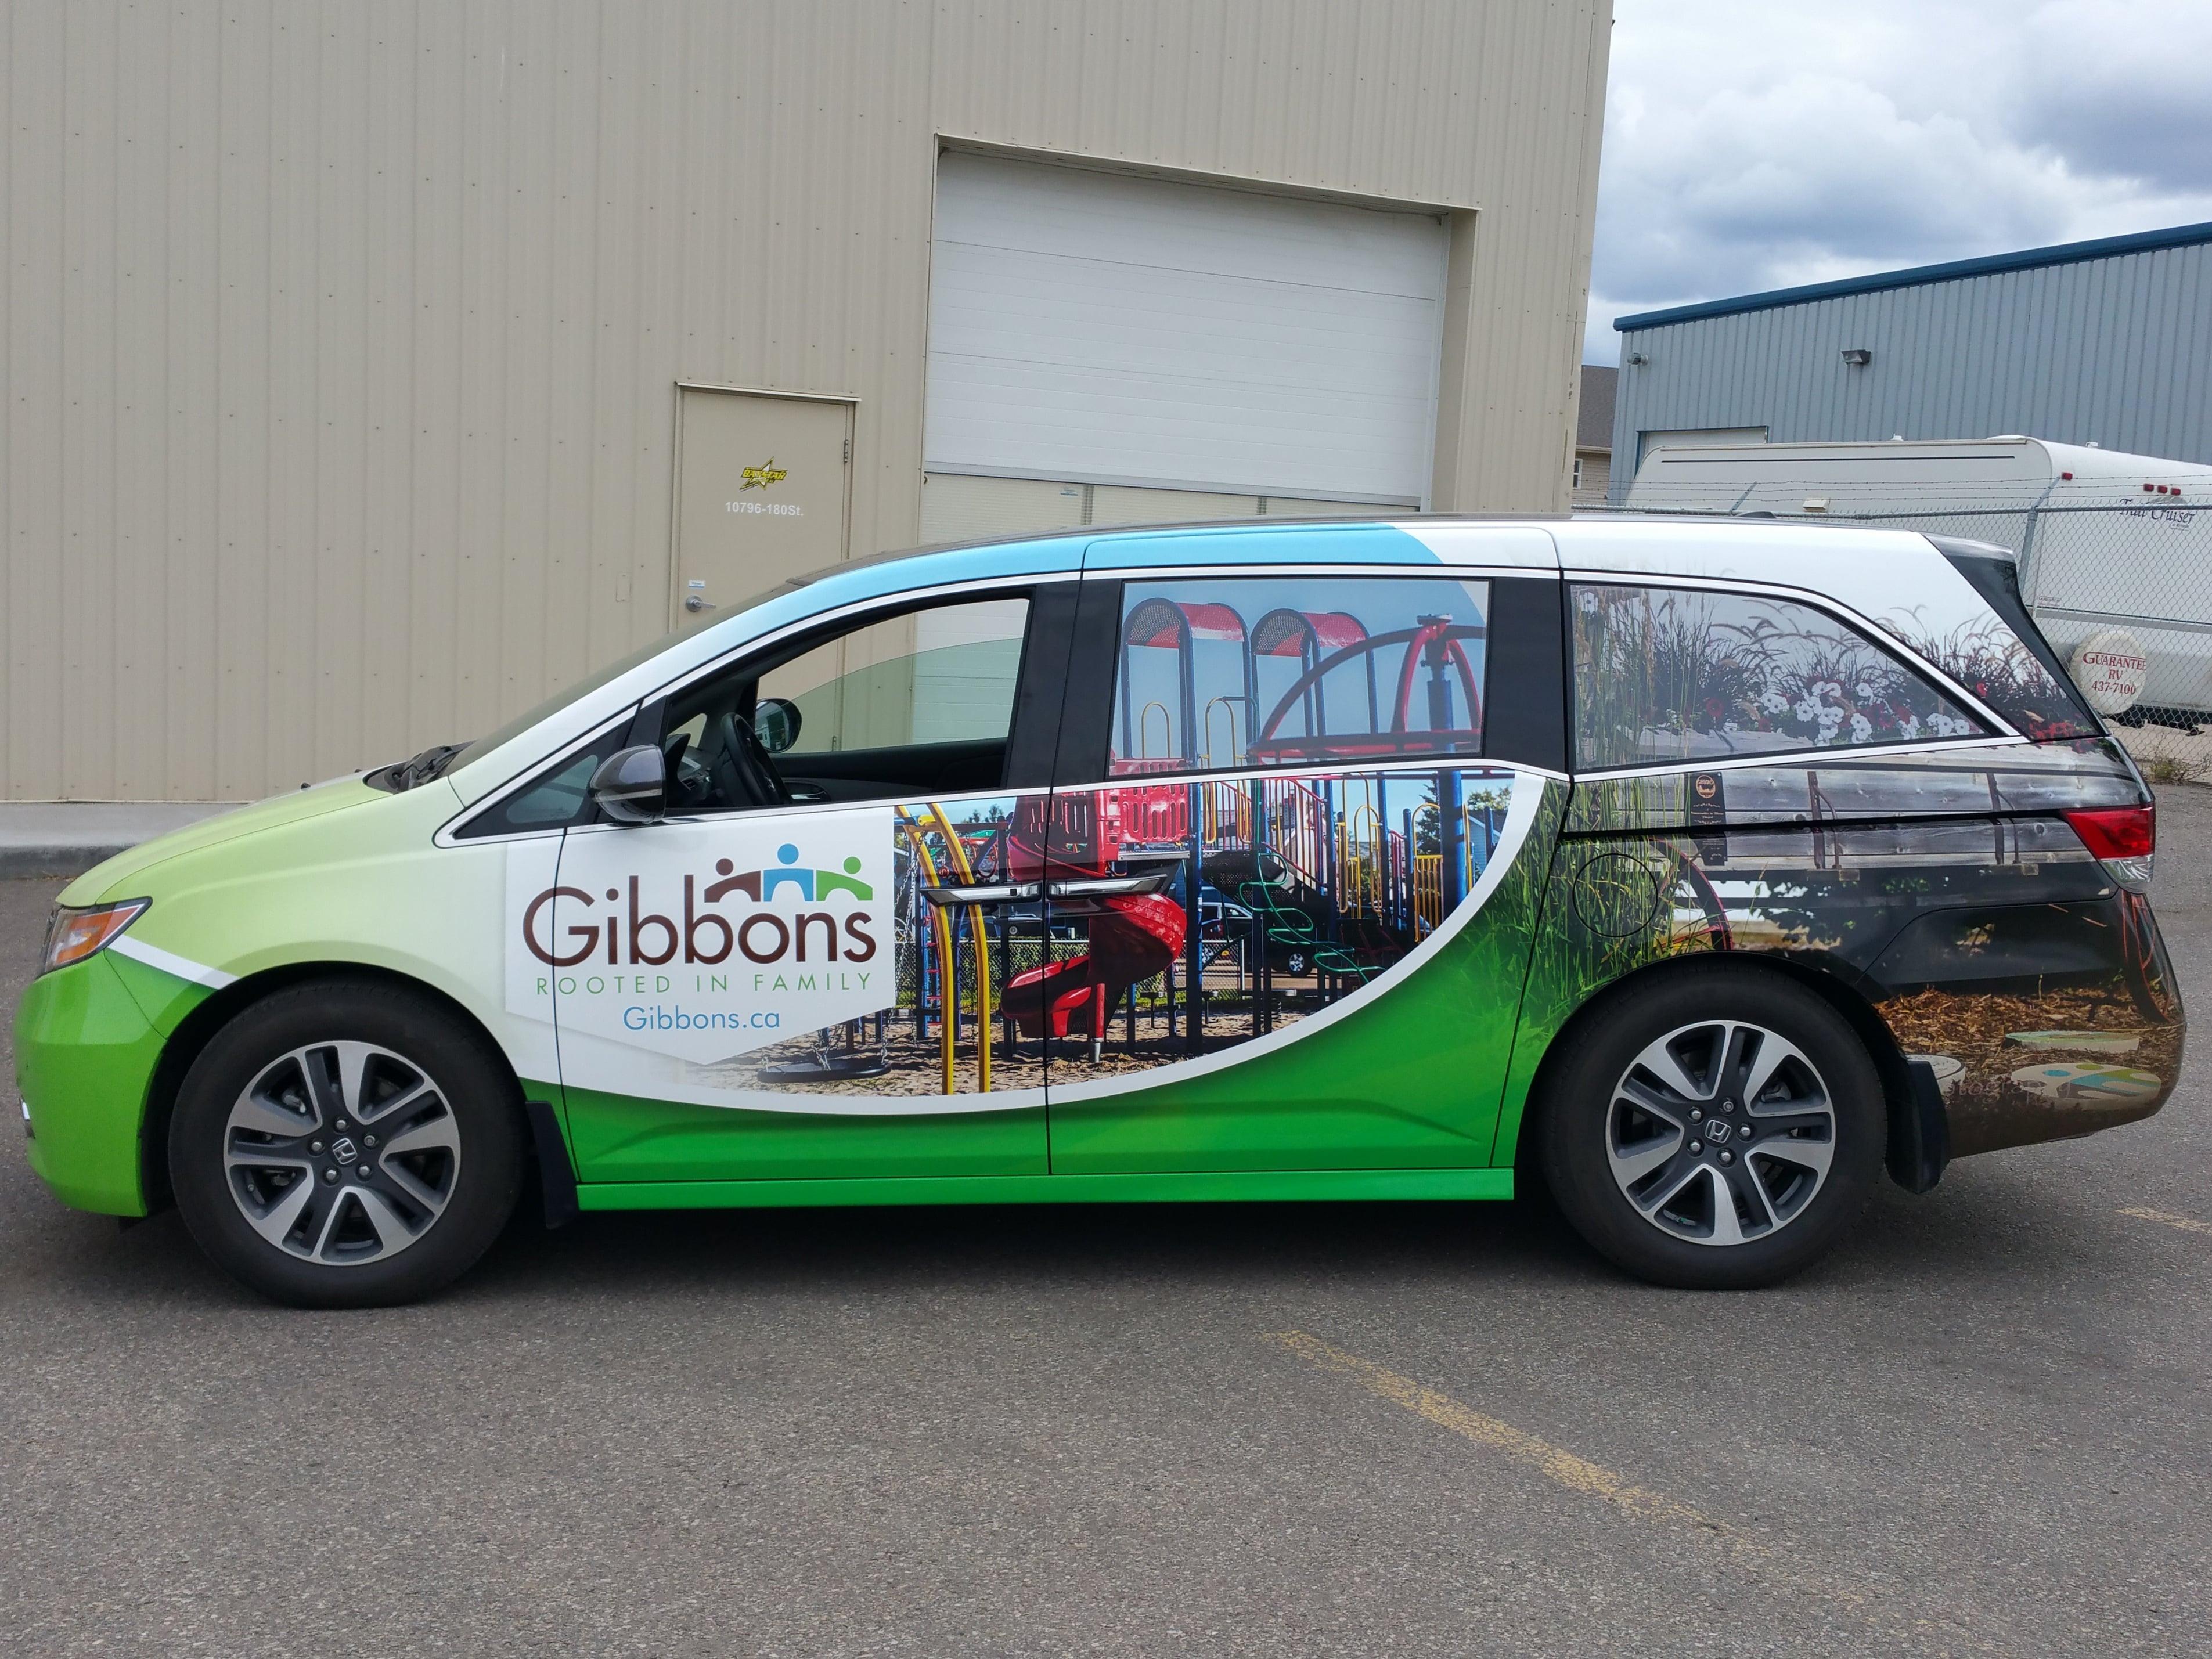 Gibbons van full wrap.